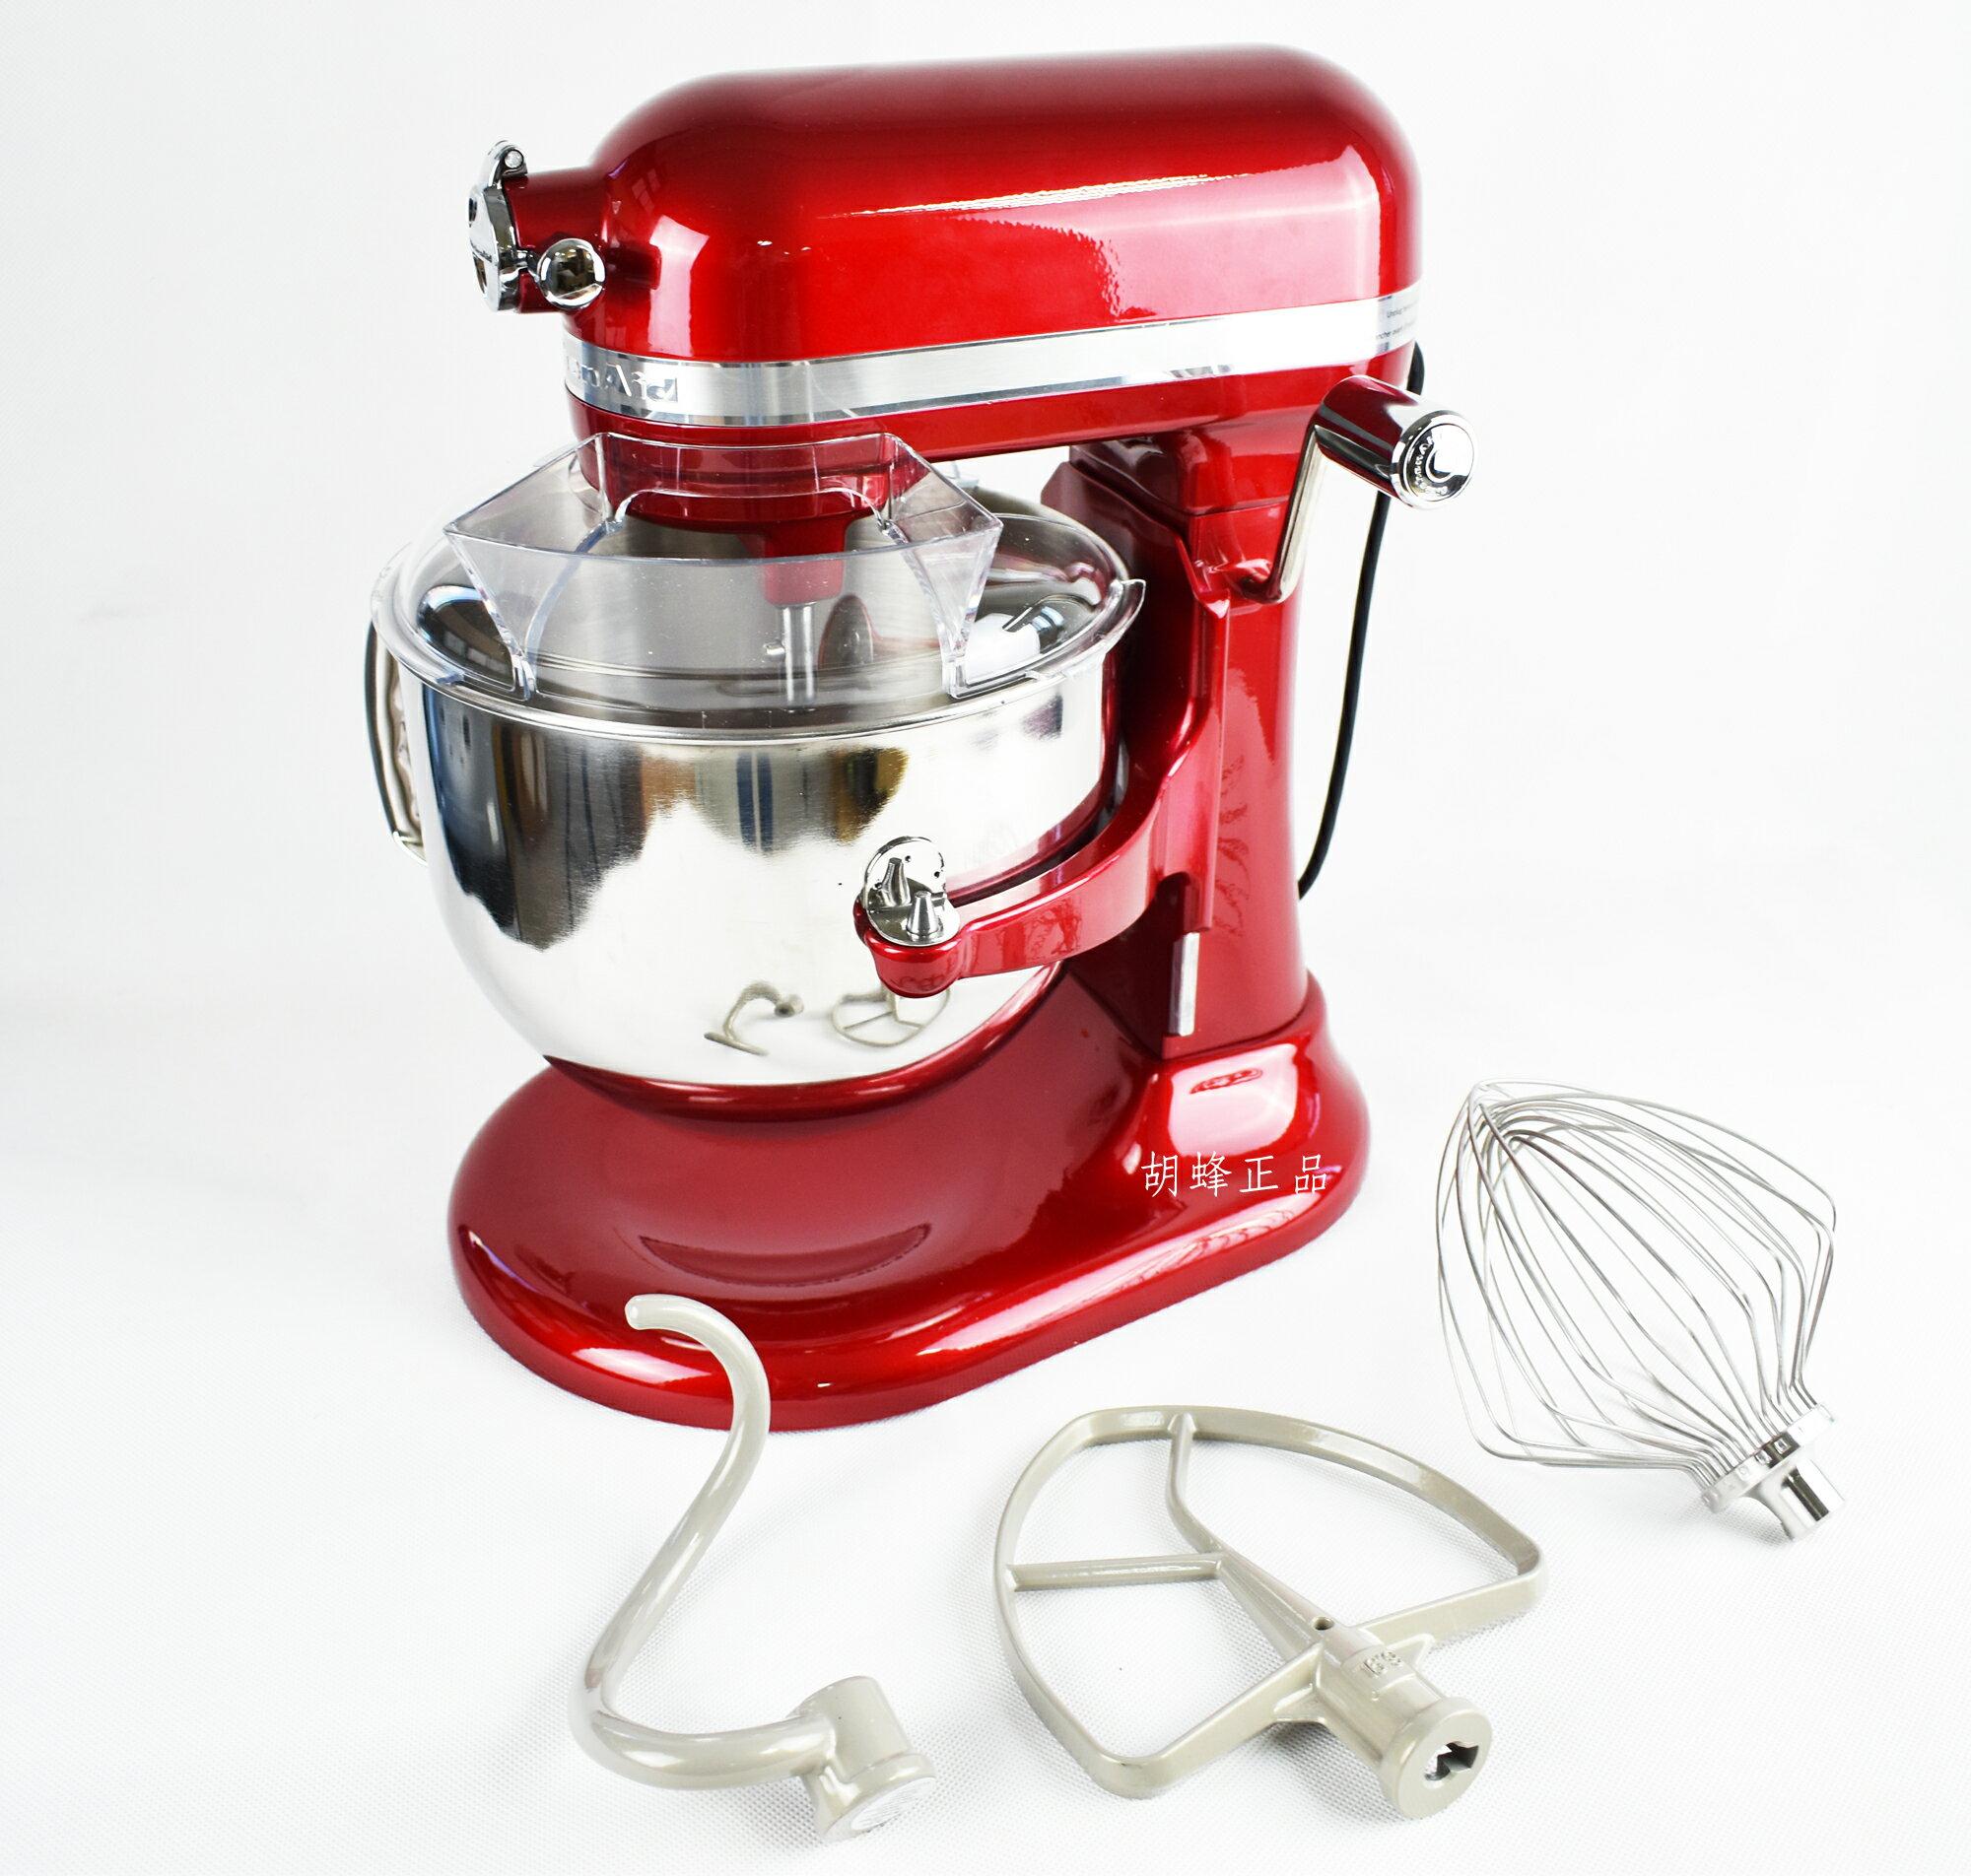 ㊣胡蜂正品㊣ 預購 KitchenAid KSM7586PCA 7-Quart 7QT Pro Line Stand Mixer Candy Apple Red升降式攪拌機(紅色)